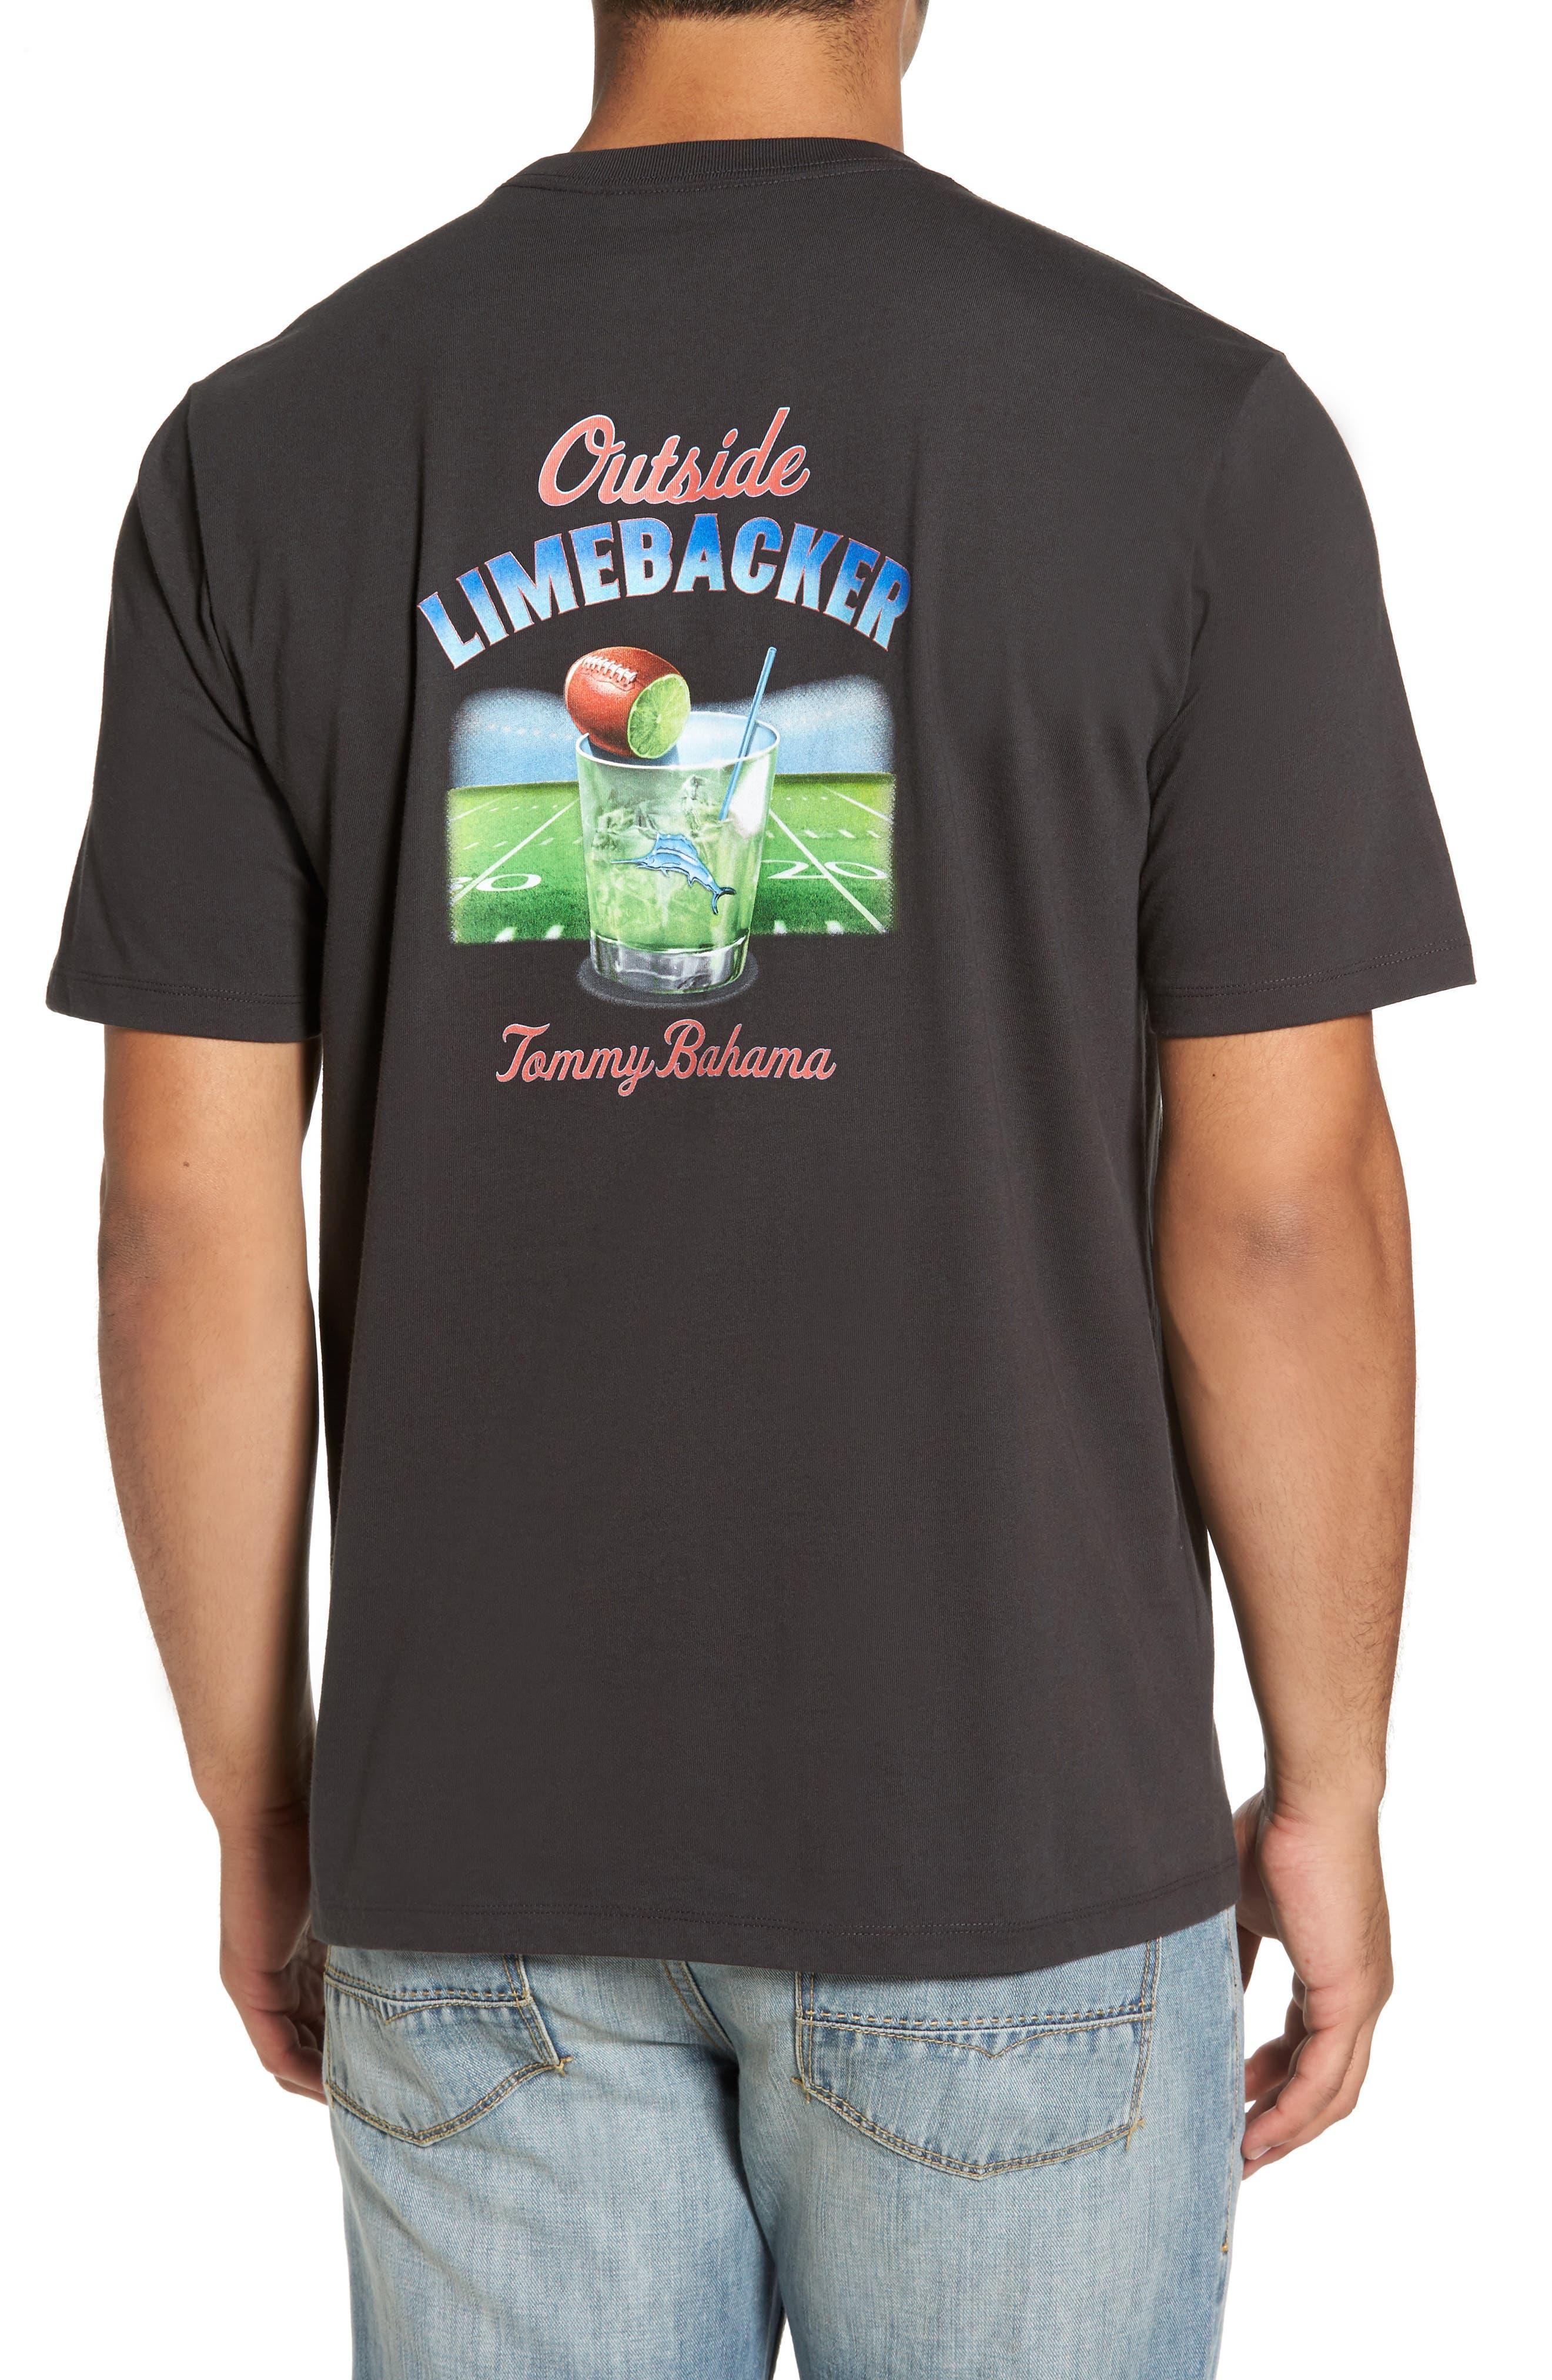 Outside Limebacker T-Shirt,                             Alternate thumbnail 2, color,                             001